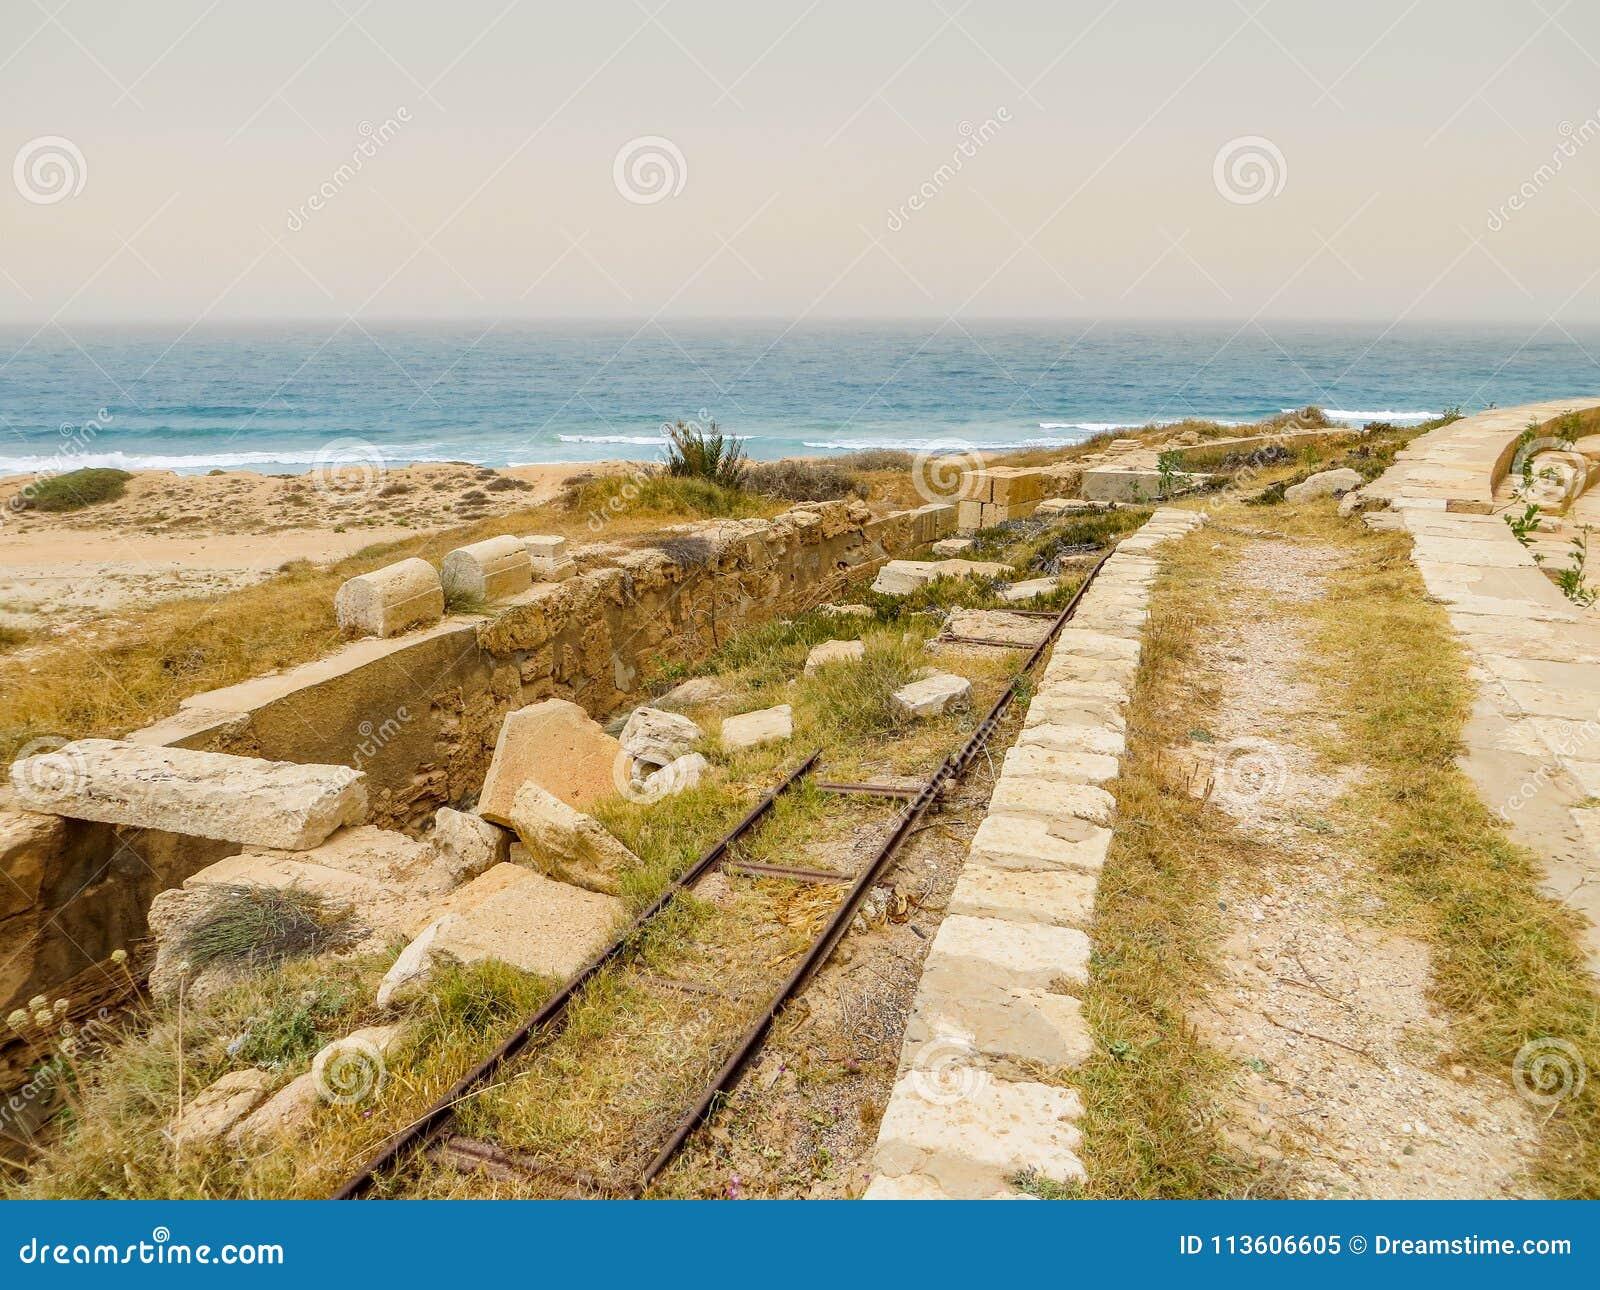 Old Italian railroad tracks among ancient Roman ruins on the Mediterranean coast of Libya at Leptis Magna